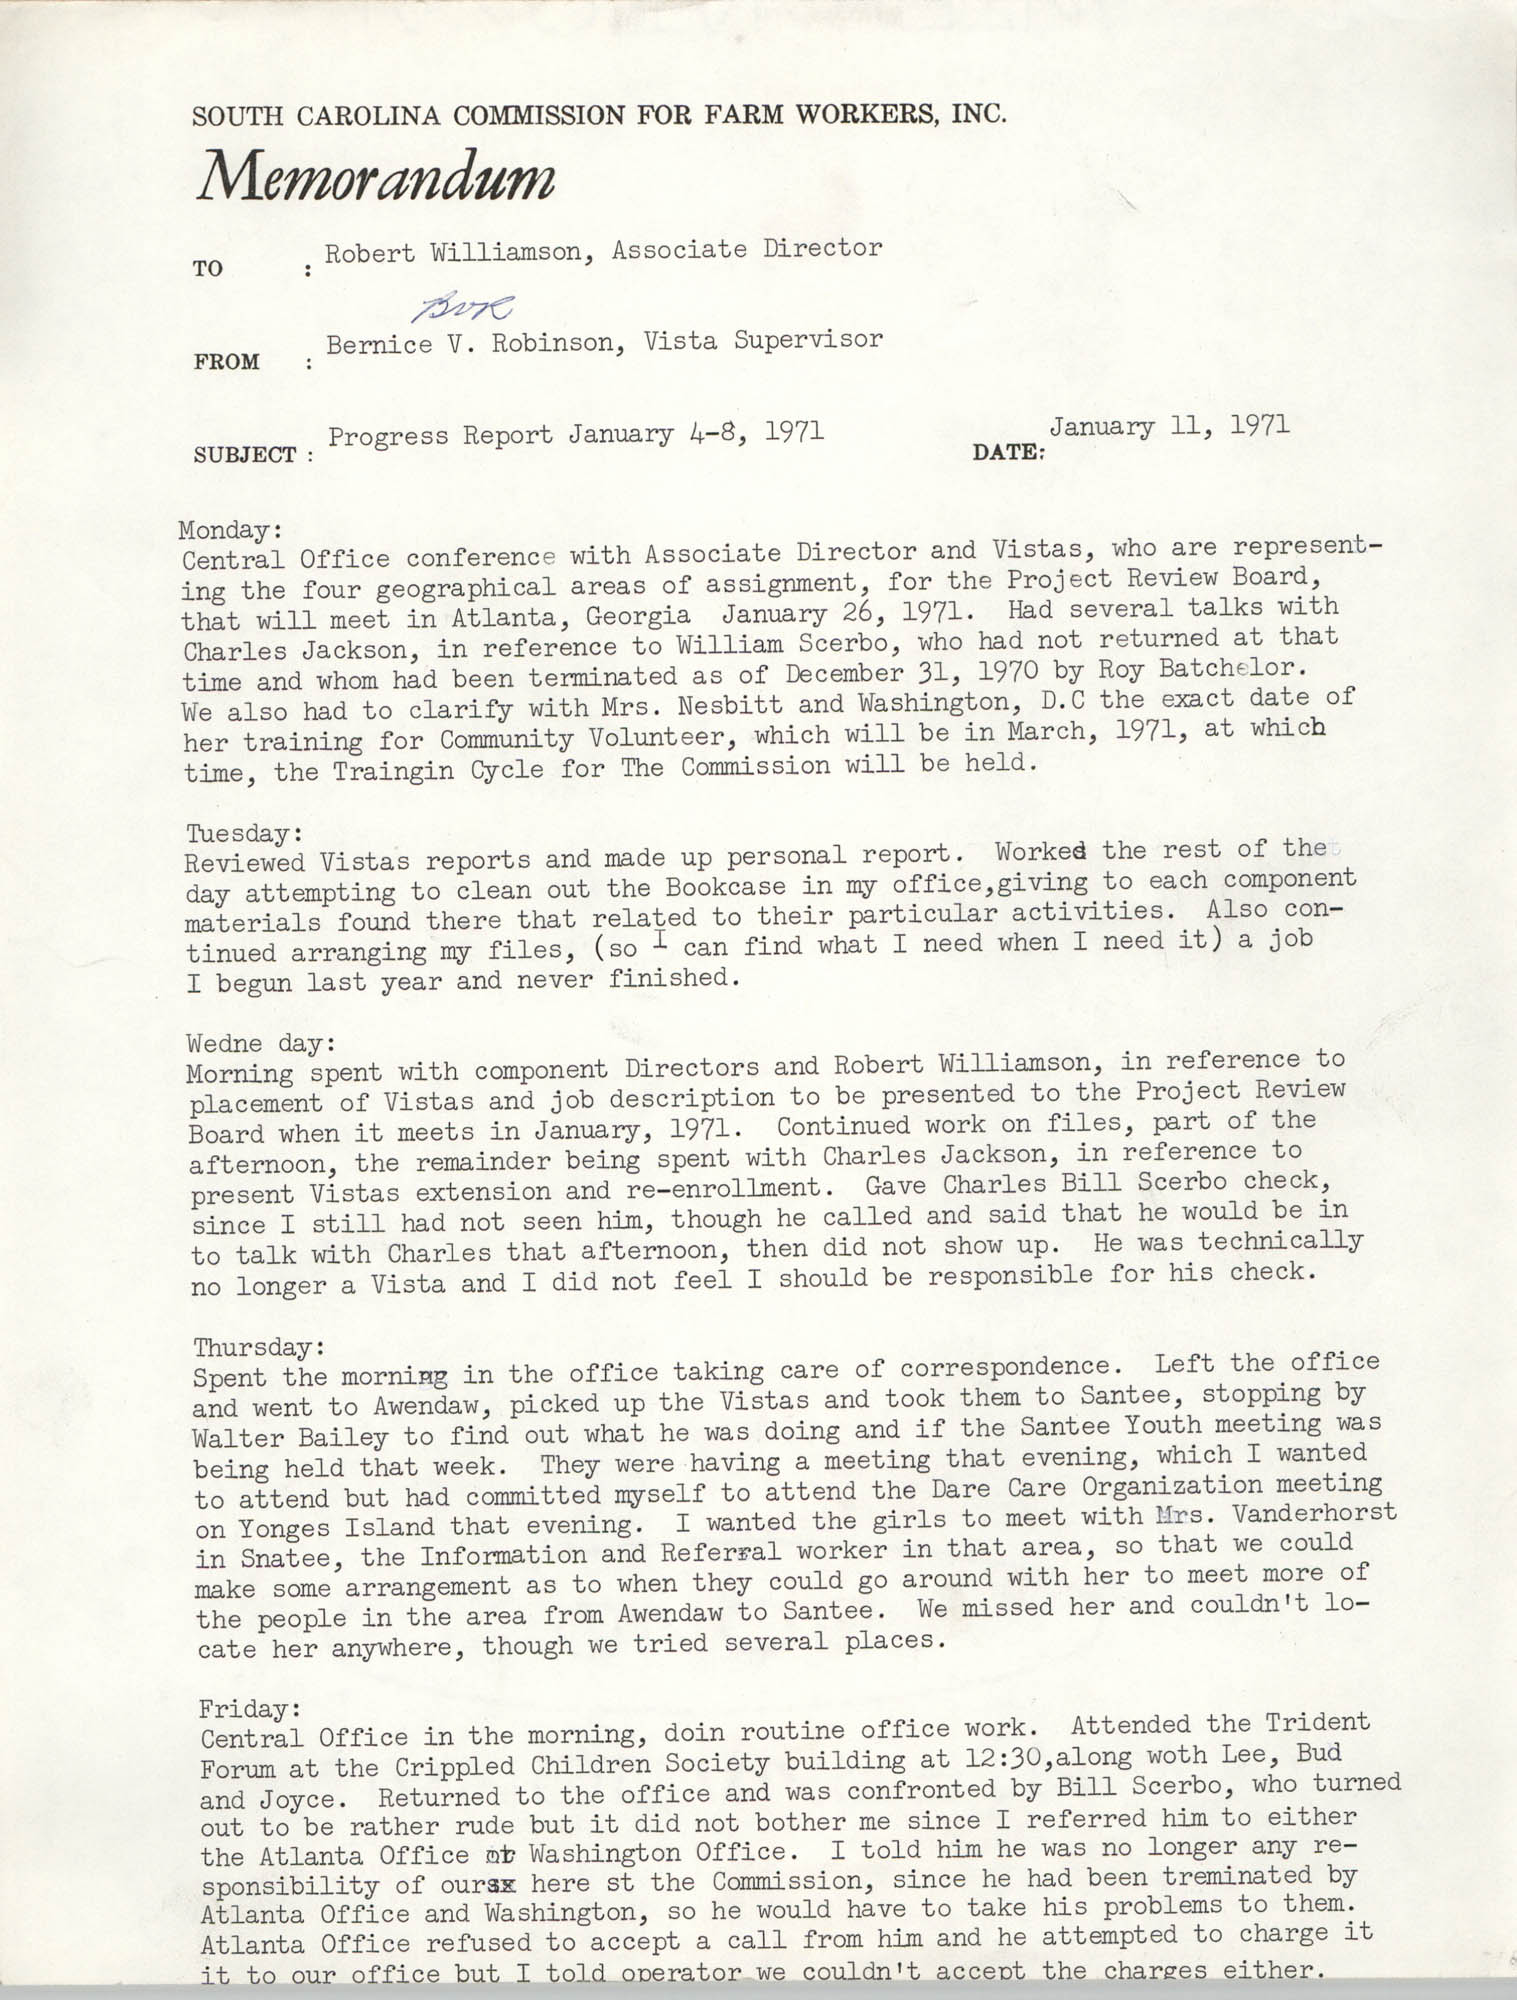 Memorandum from Bernice V. Robinson to Robert Williamson, January 11, 1971